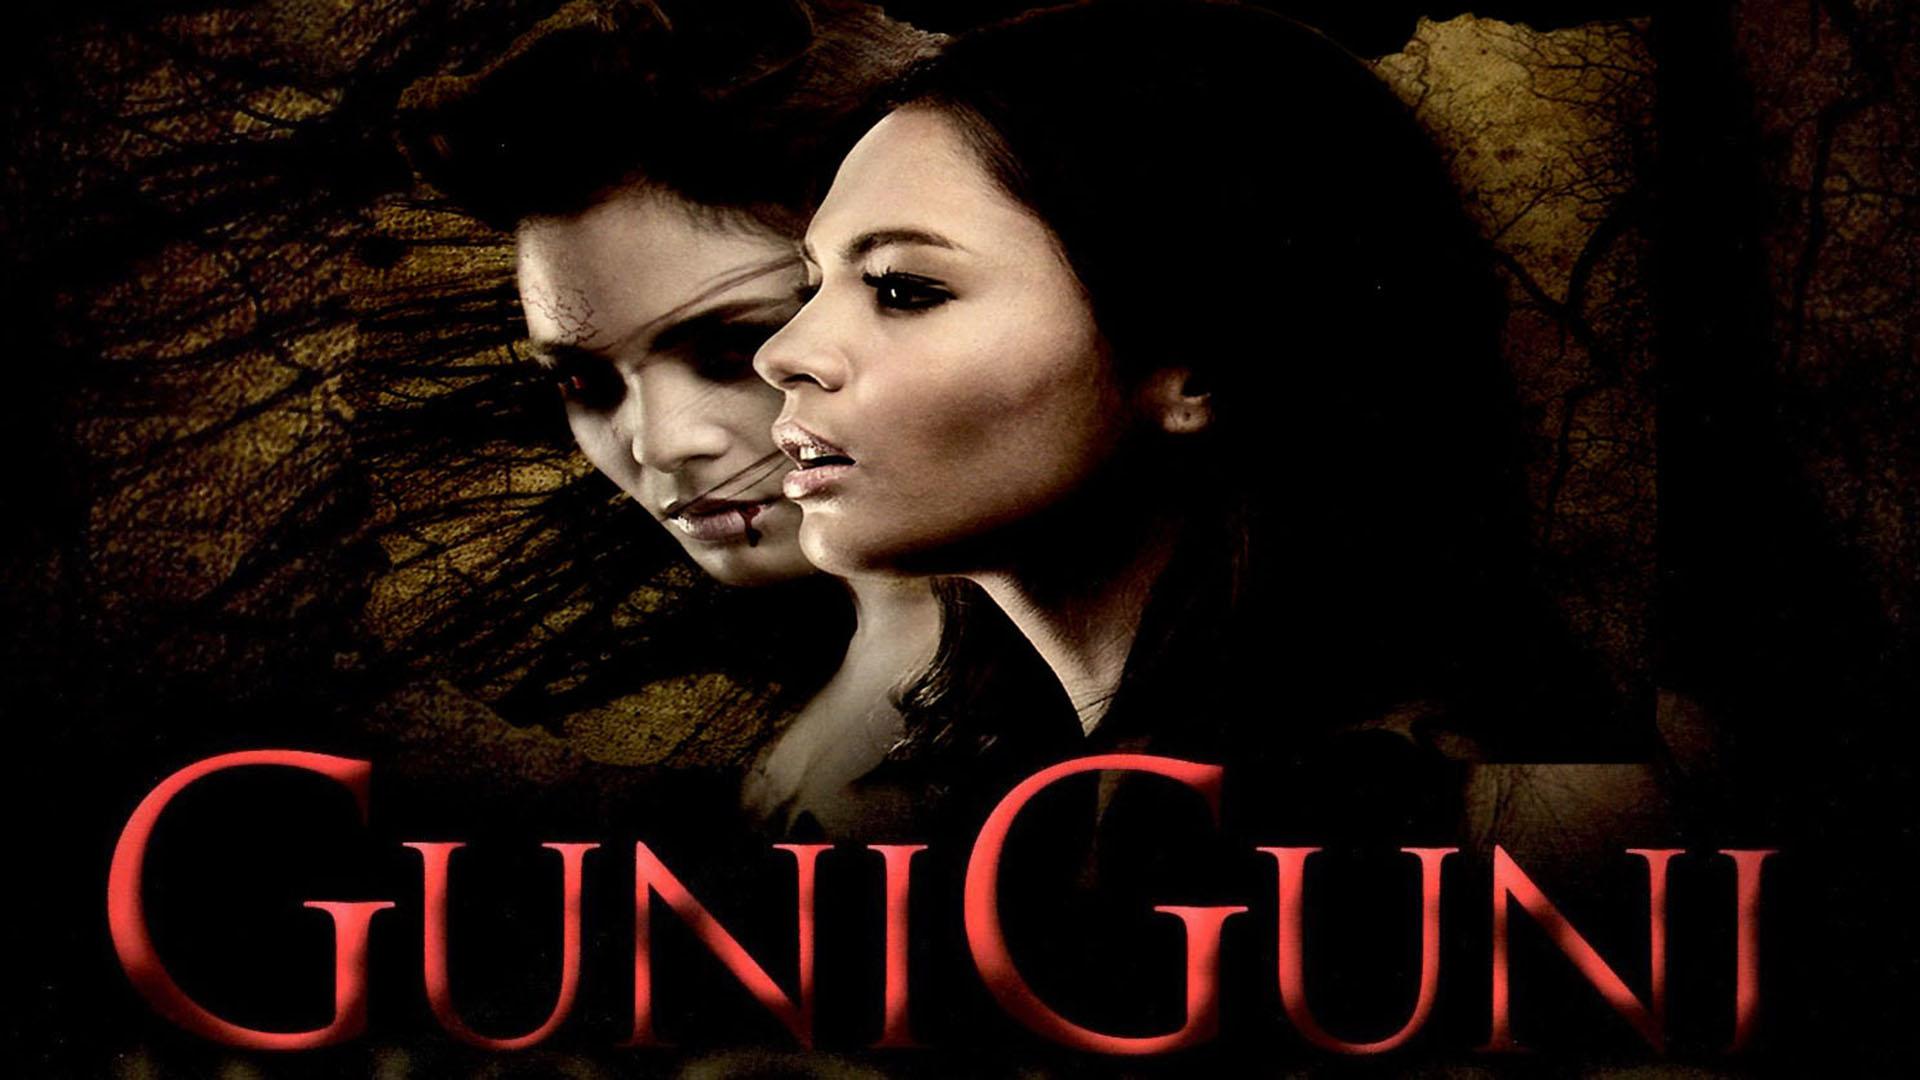 GuniGuni